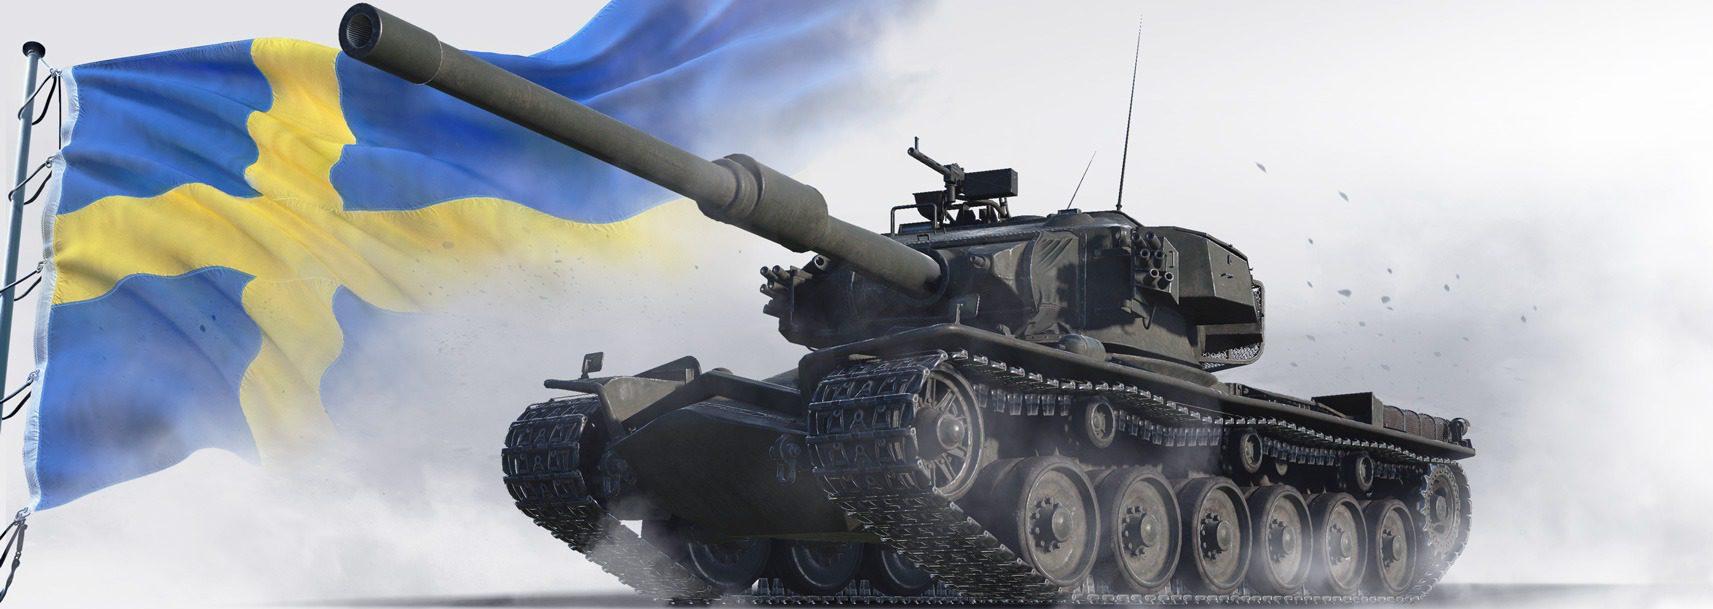 WoT_Template_New-Tank_Strv_K_EN-e1584681745618 (1)